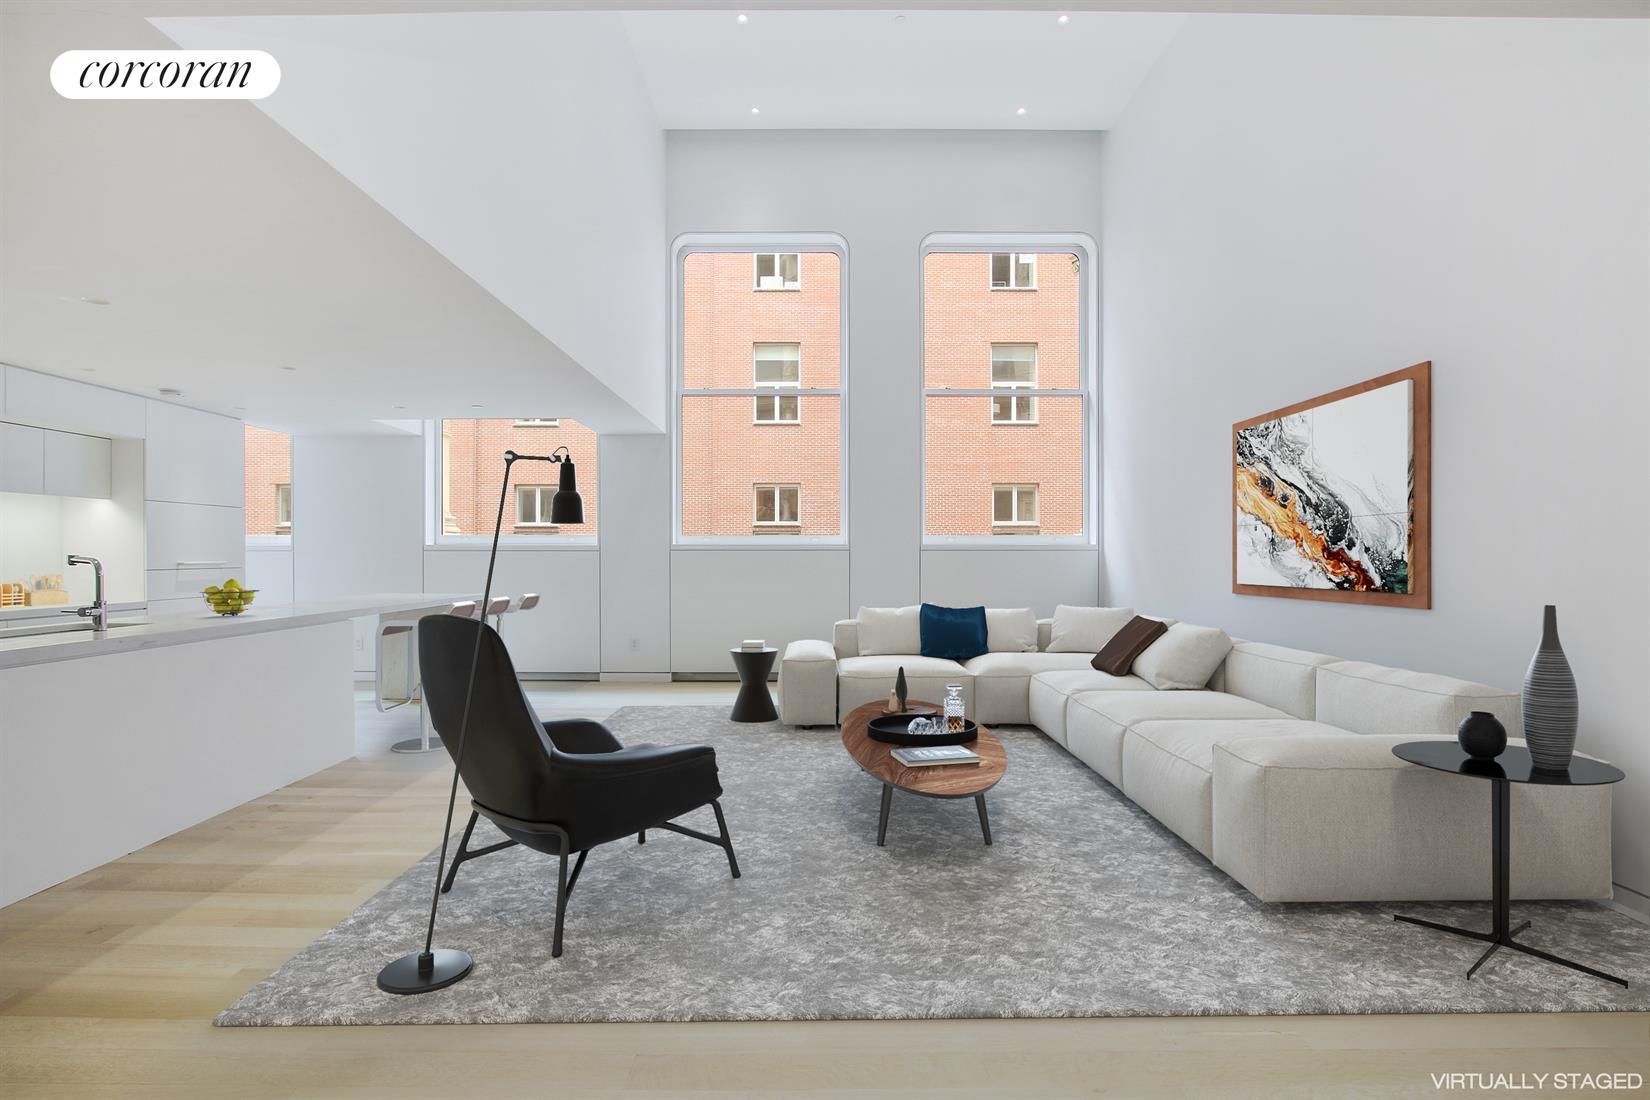 67 Franklin Street 2 3c Manhattan Ny 10013 Property For Sale